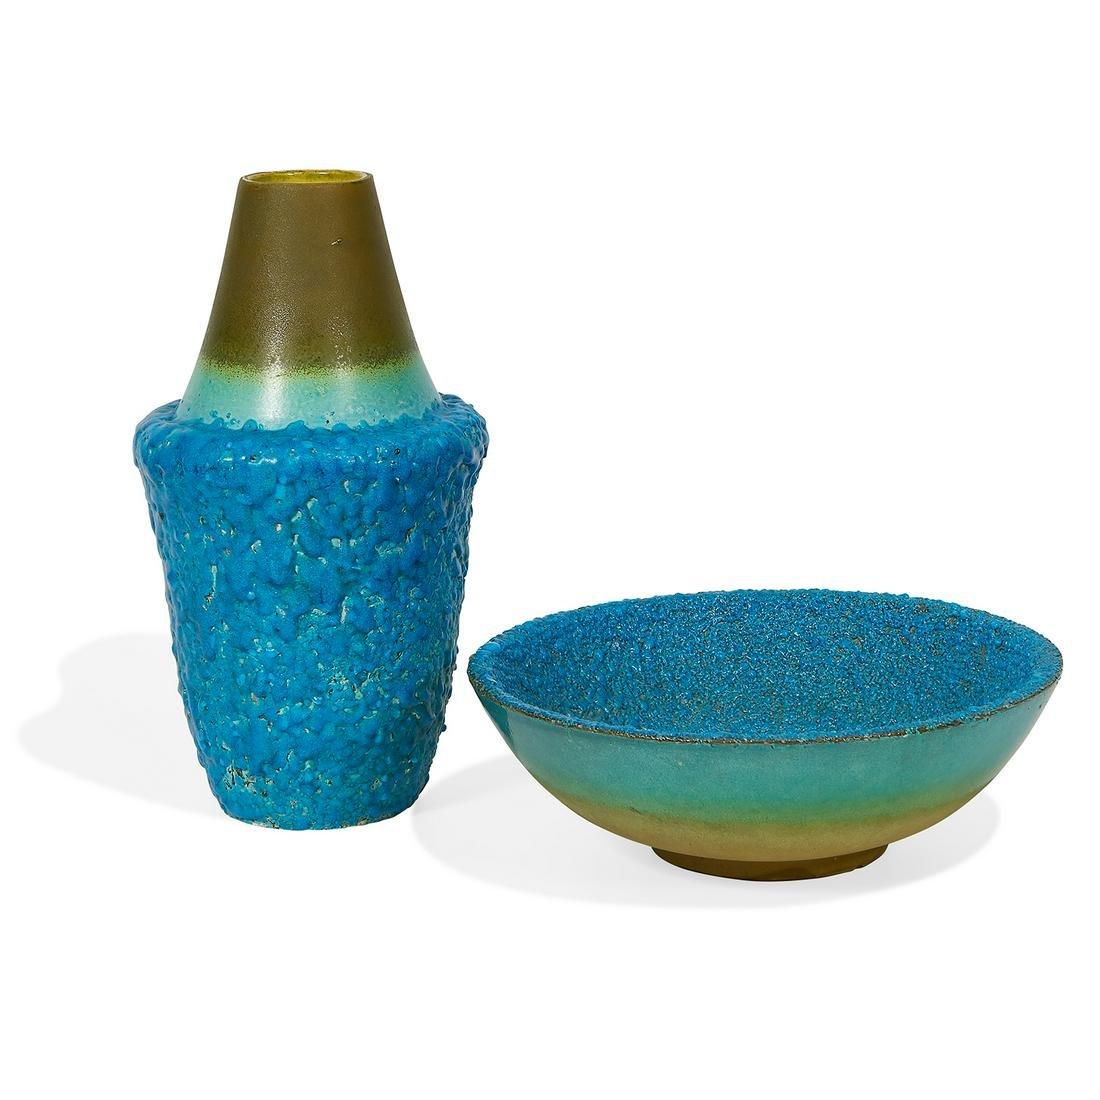 Bitossi / Raymor vase, #1357 and bowl, #1356